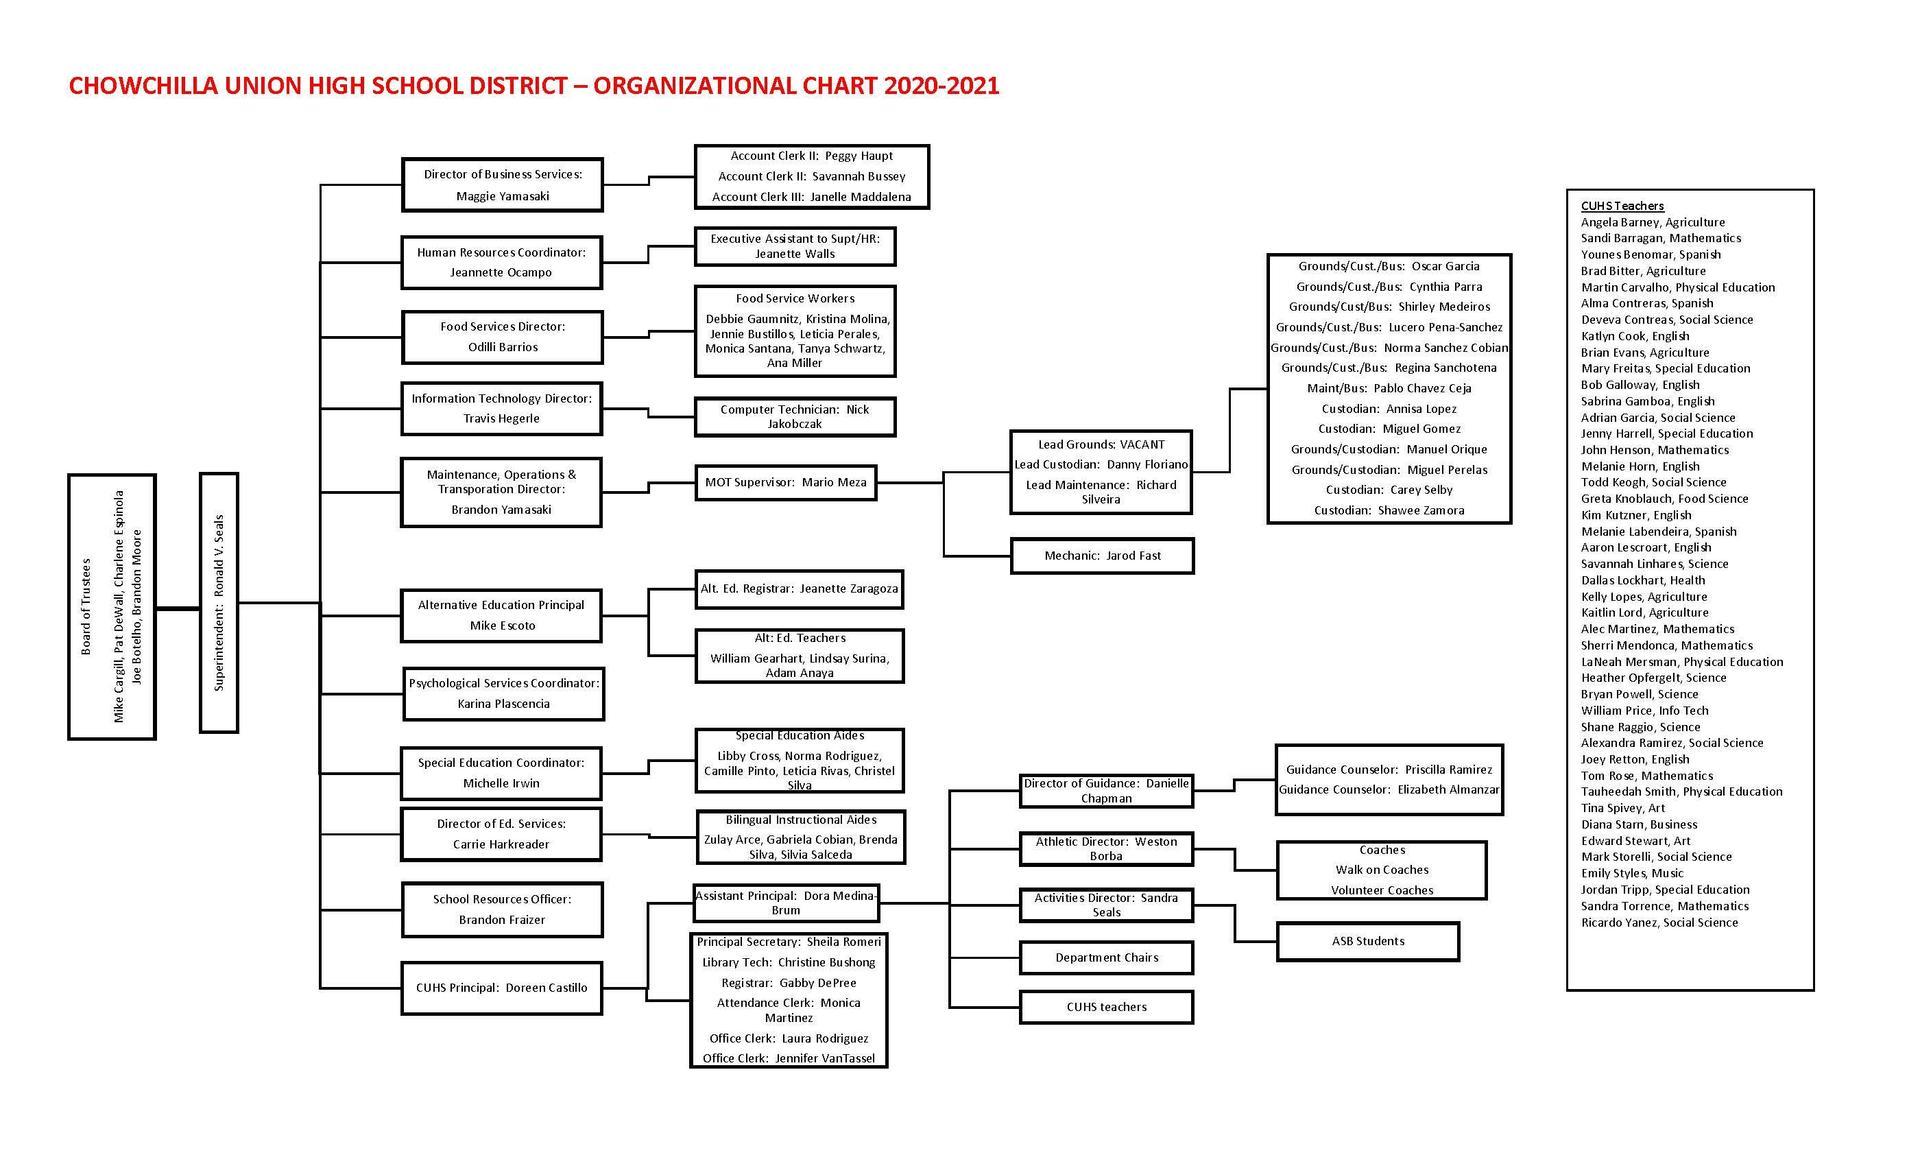 Organizational Chart as of 12/1/2020